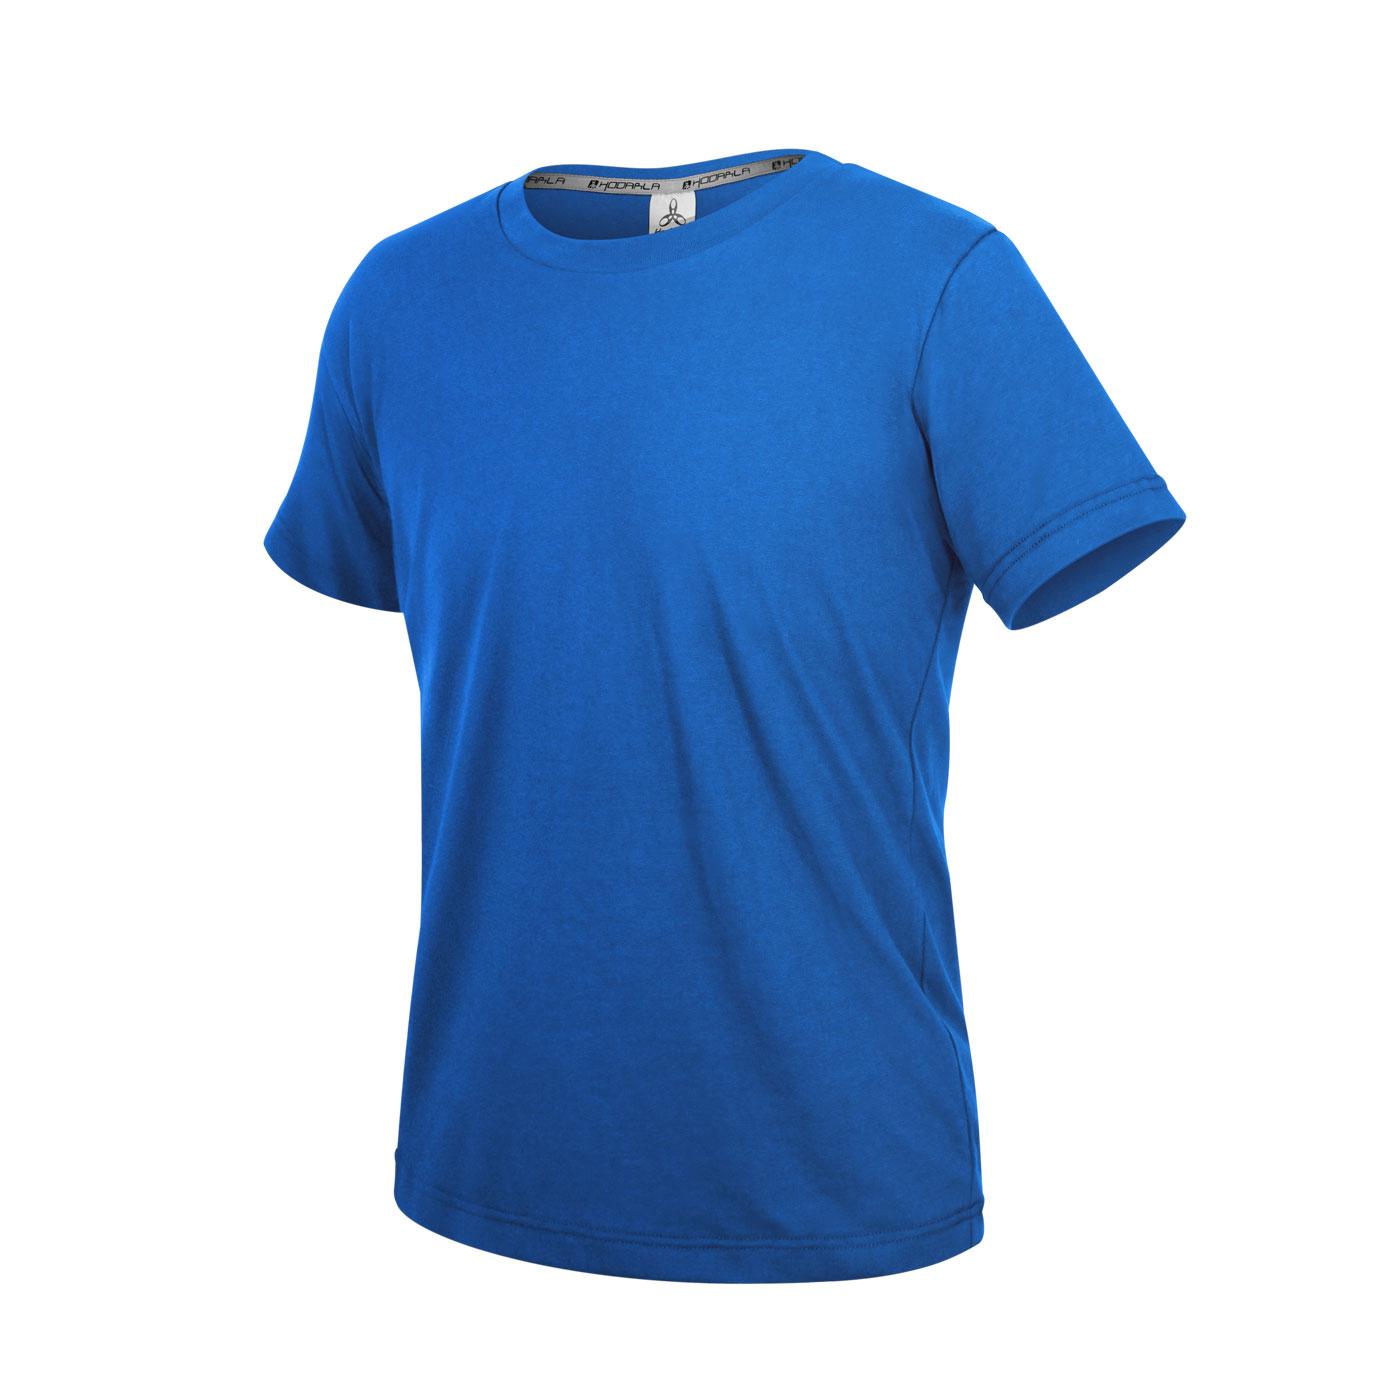 HODARLA ZERO DRY機能排汗棉T 3158401 - 寶藍